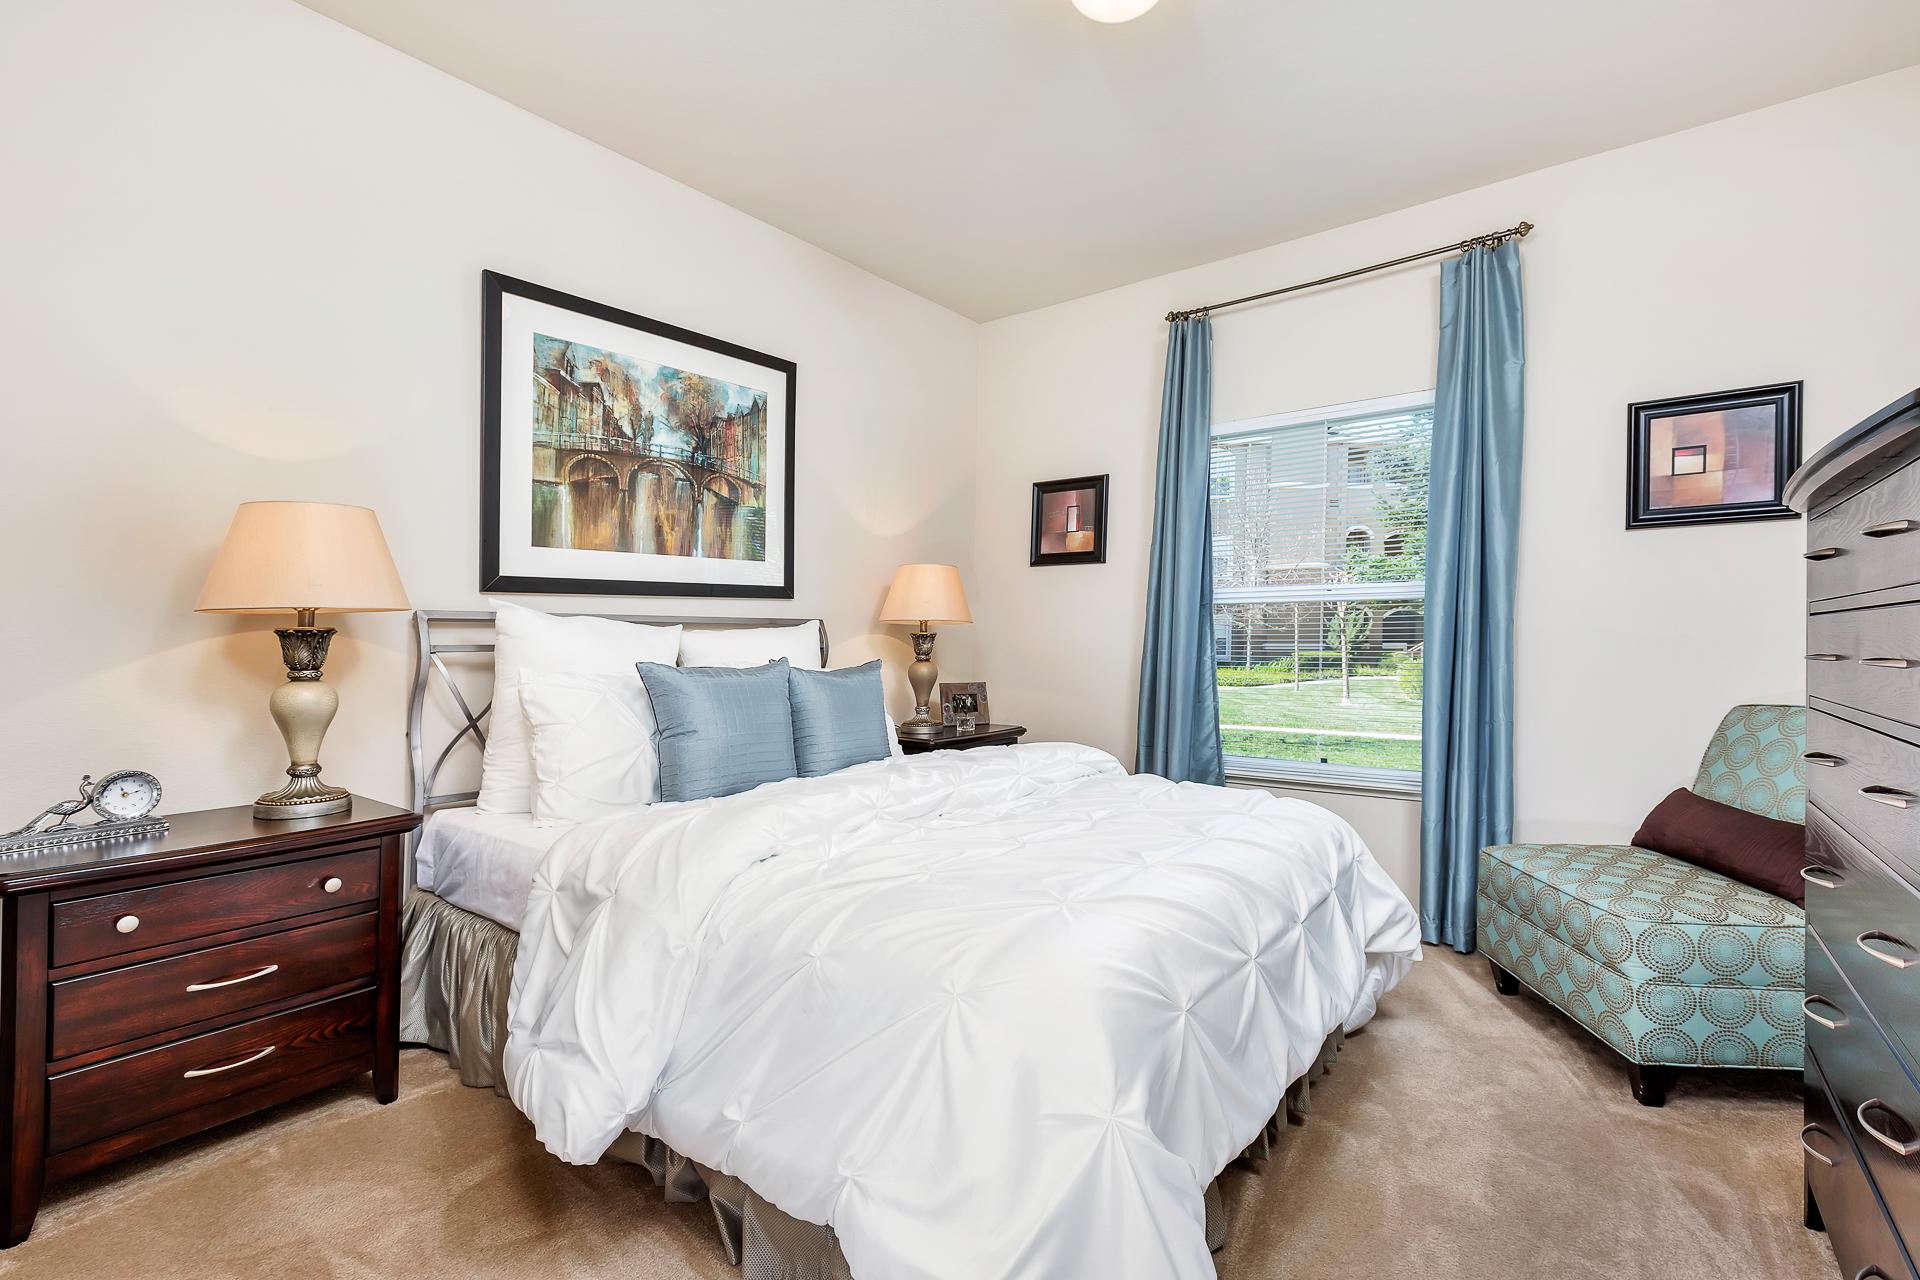 31-Sycamore-Terrace-Apartments-Photo-by-Brad-Ahlm-FairMarketPhoto-FullRes.jpg